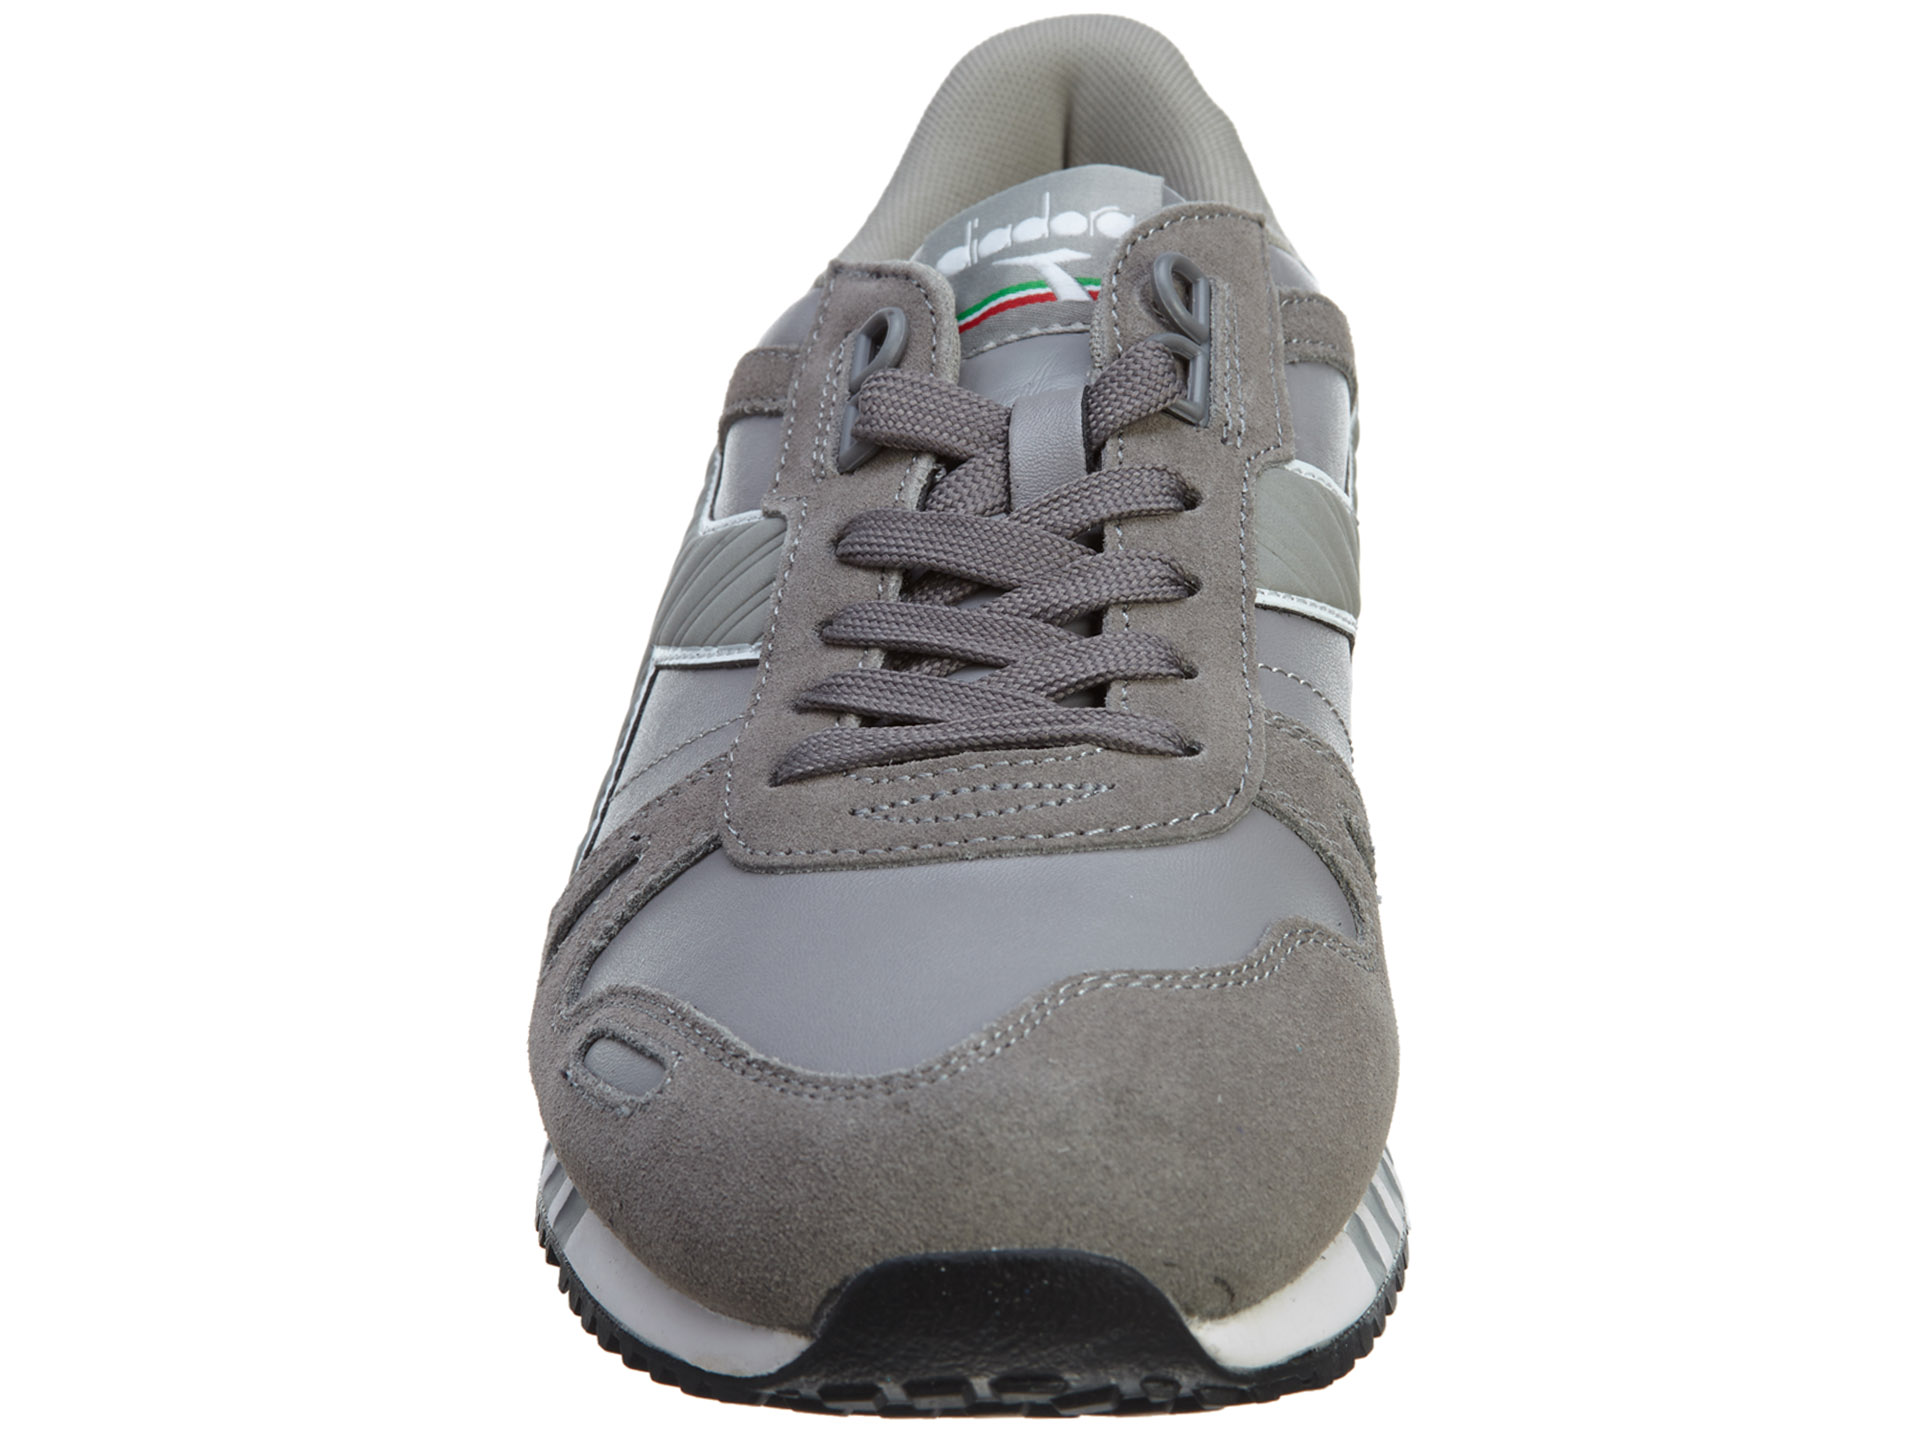 Diadora Titan Leather L/s Sneakers Mens Style : 160354